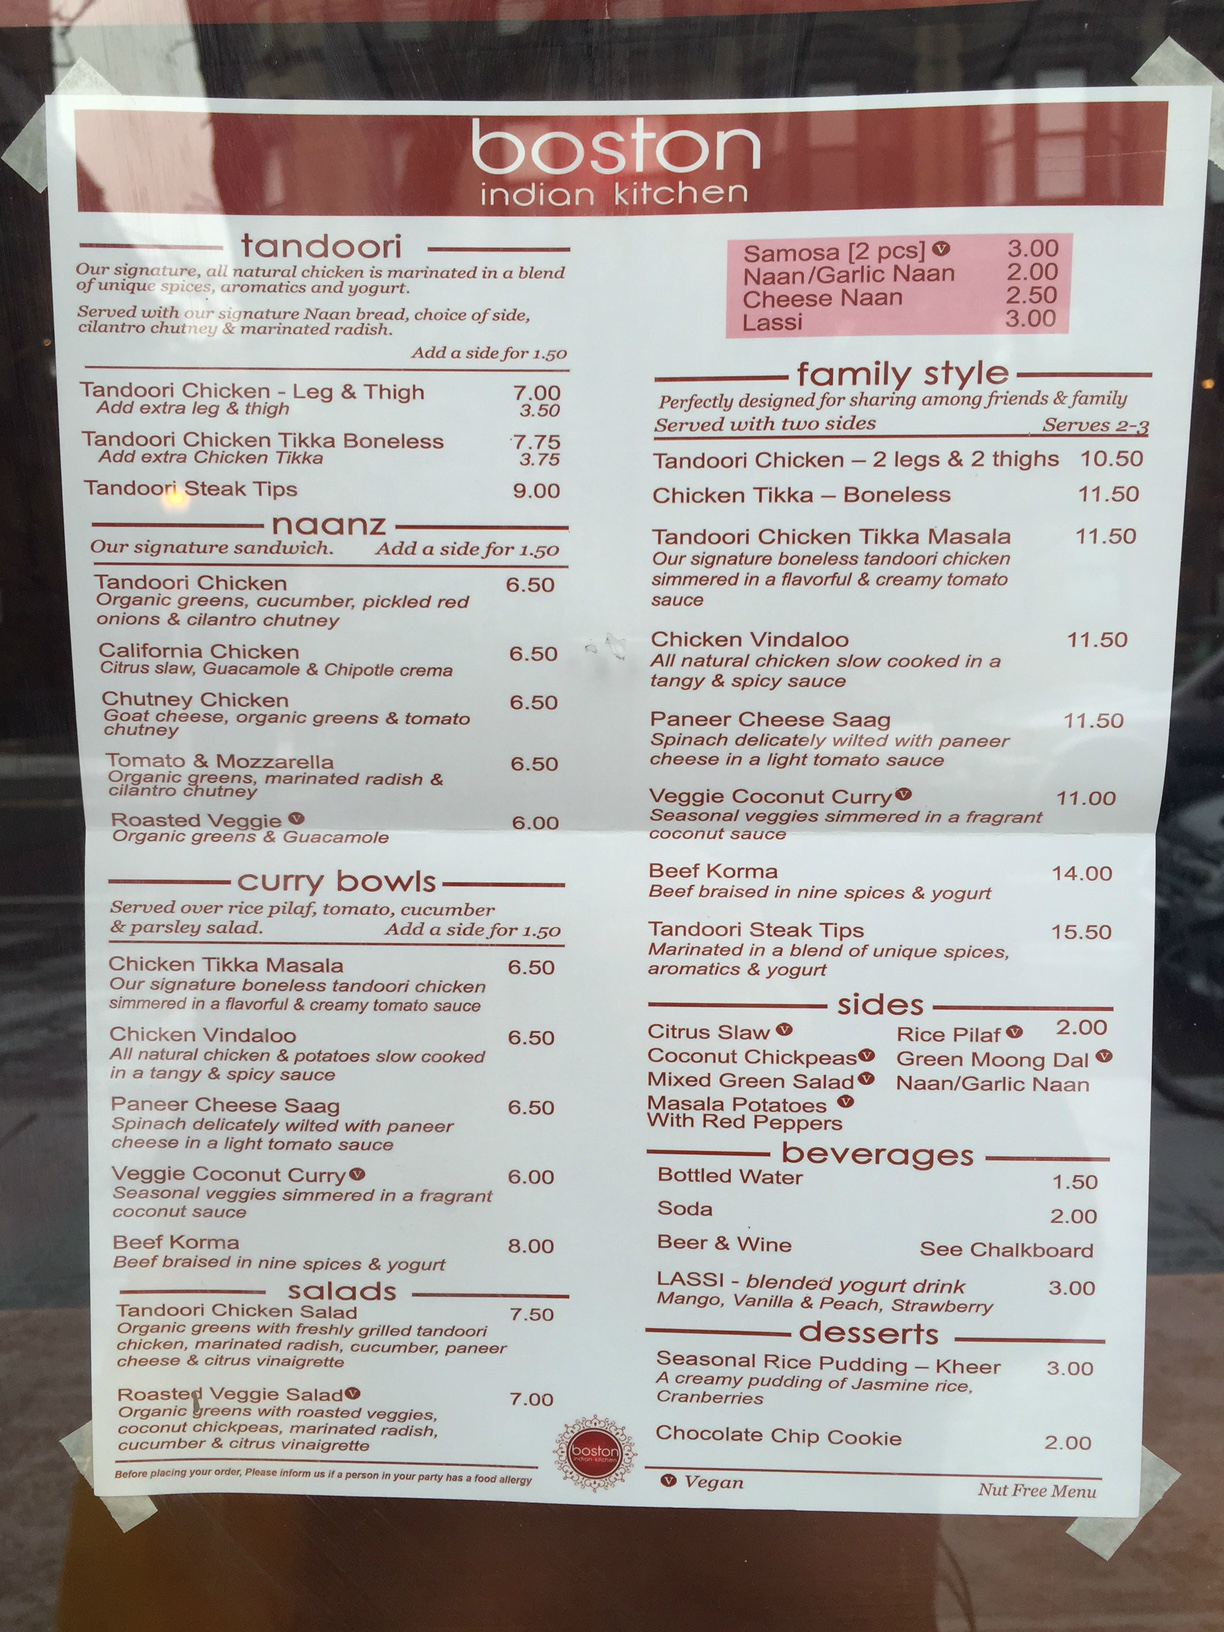 Boston Indian Kitchen Opens Tomorrow With 'naanz' And More. Kitchen Sex Scene. China Kitchen Baton Rouge. Kitchen Vastu. Best Kitchen Tools. California Pizza Kitchen Valencia. Kitchen Islands Pinterest. Modern Style Kitchen. Kitchen Sink Plumbing Parts